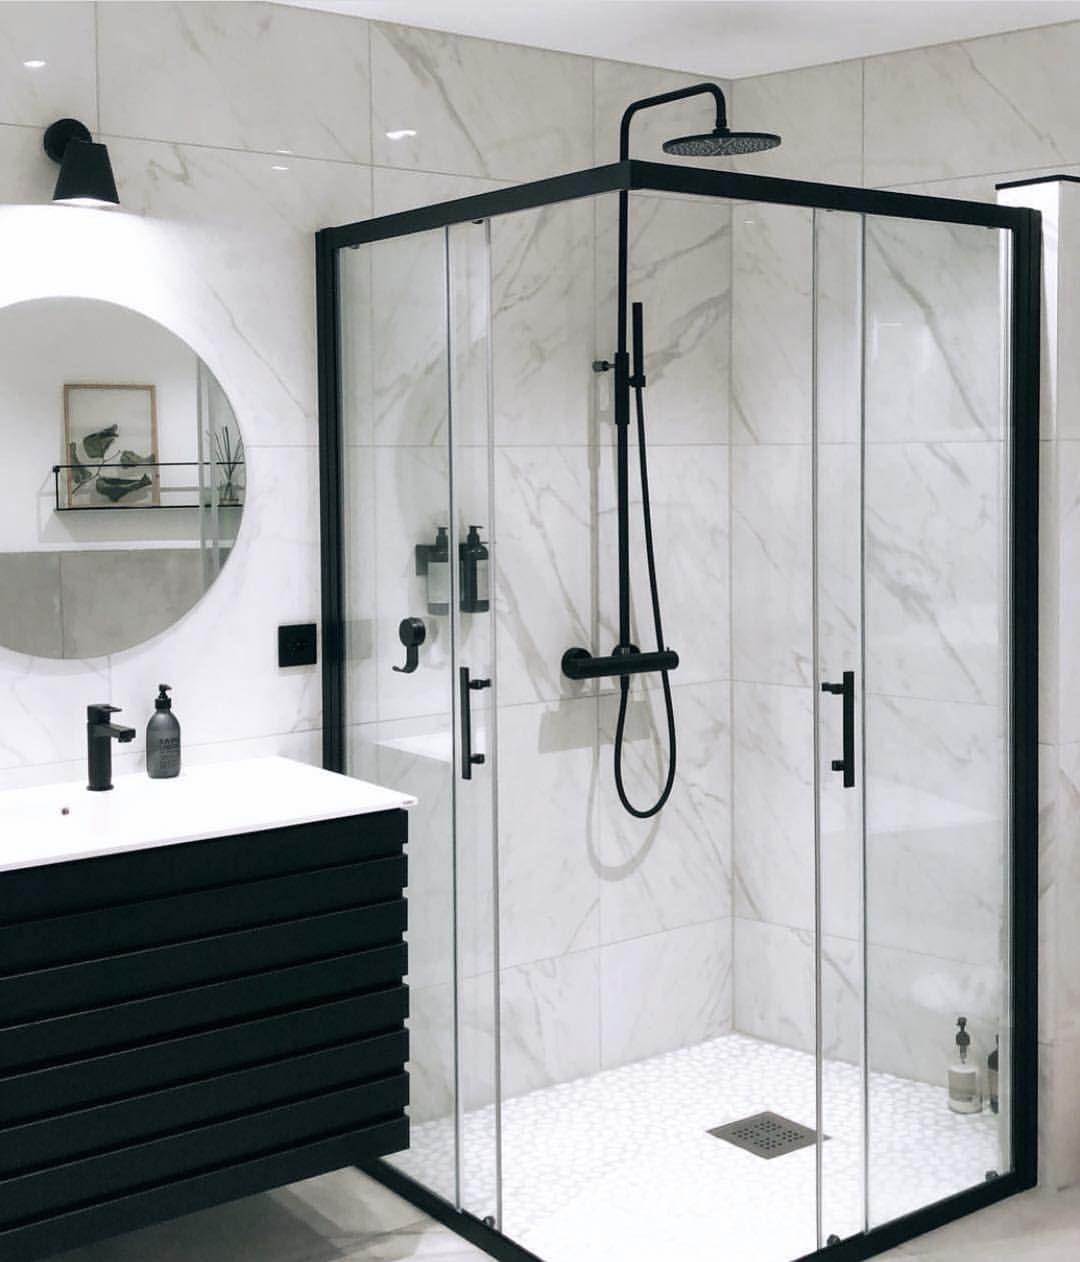 Pin By Diana Mai On Home Design Bathroom Interior Design Modern Bathroom Design Bathroom Design